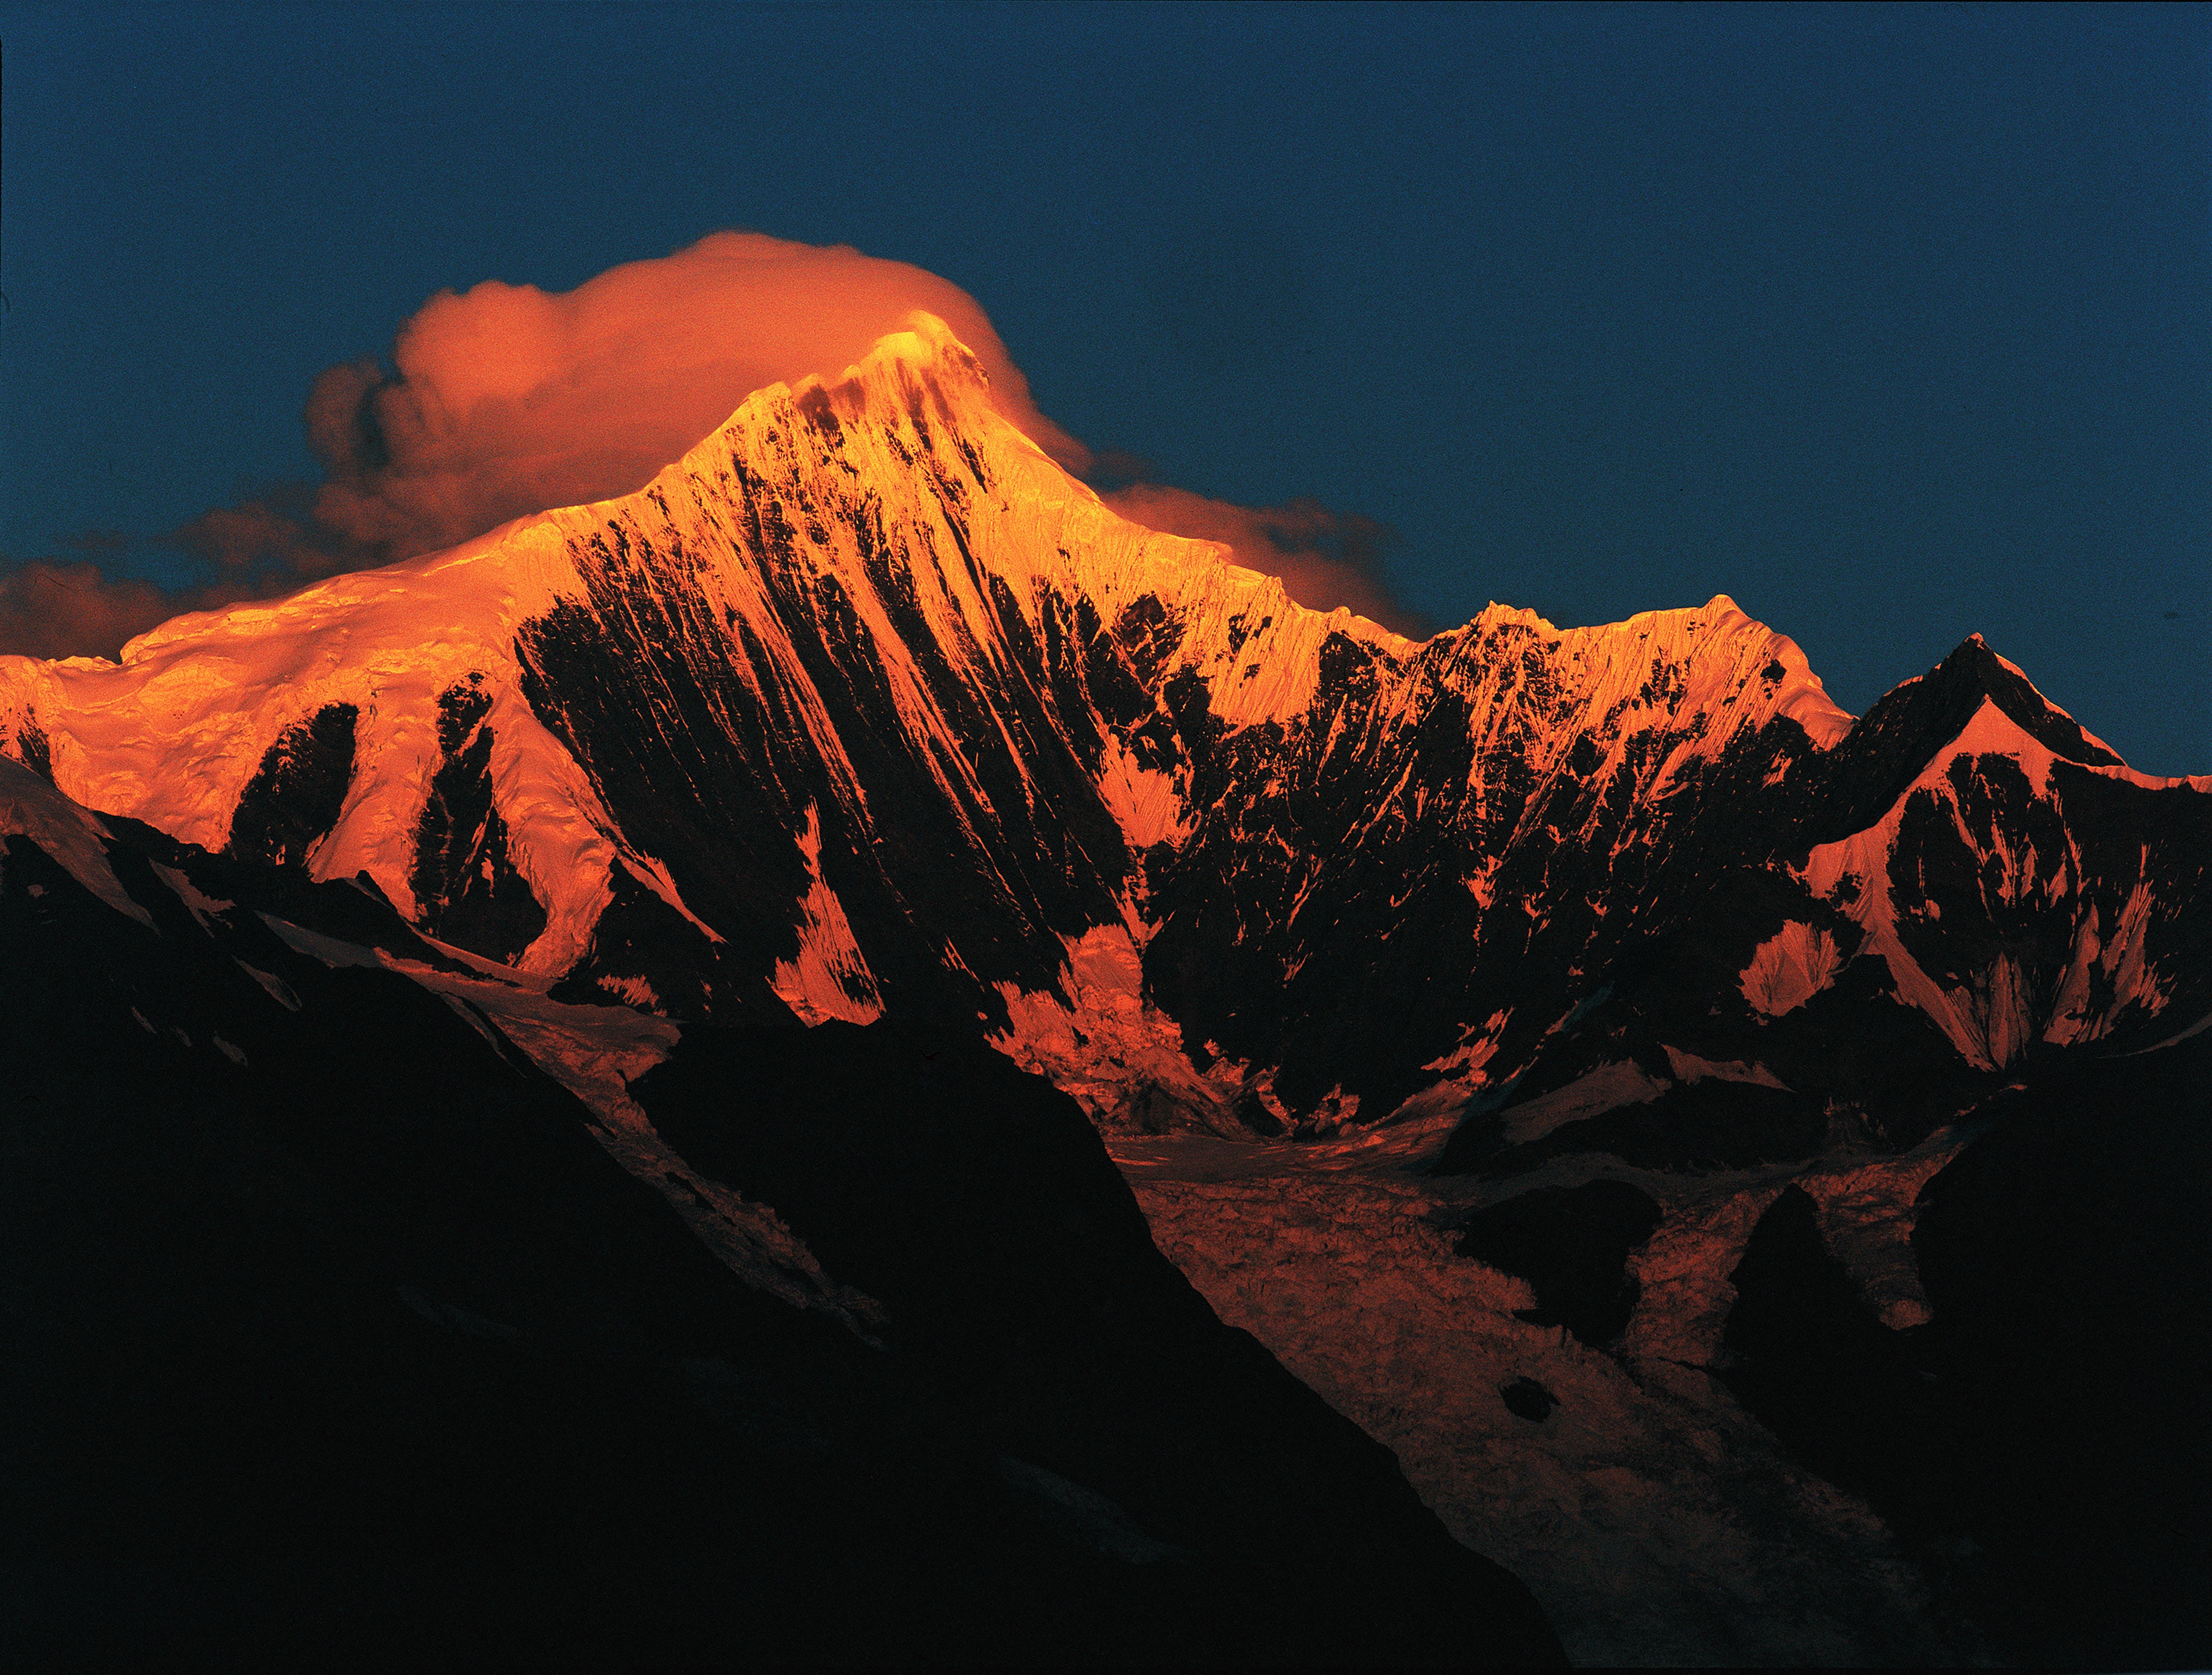 Orange sun rays illuminate a snow-capped mountain during sunrise